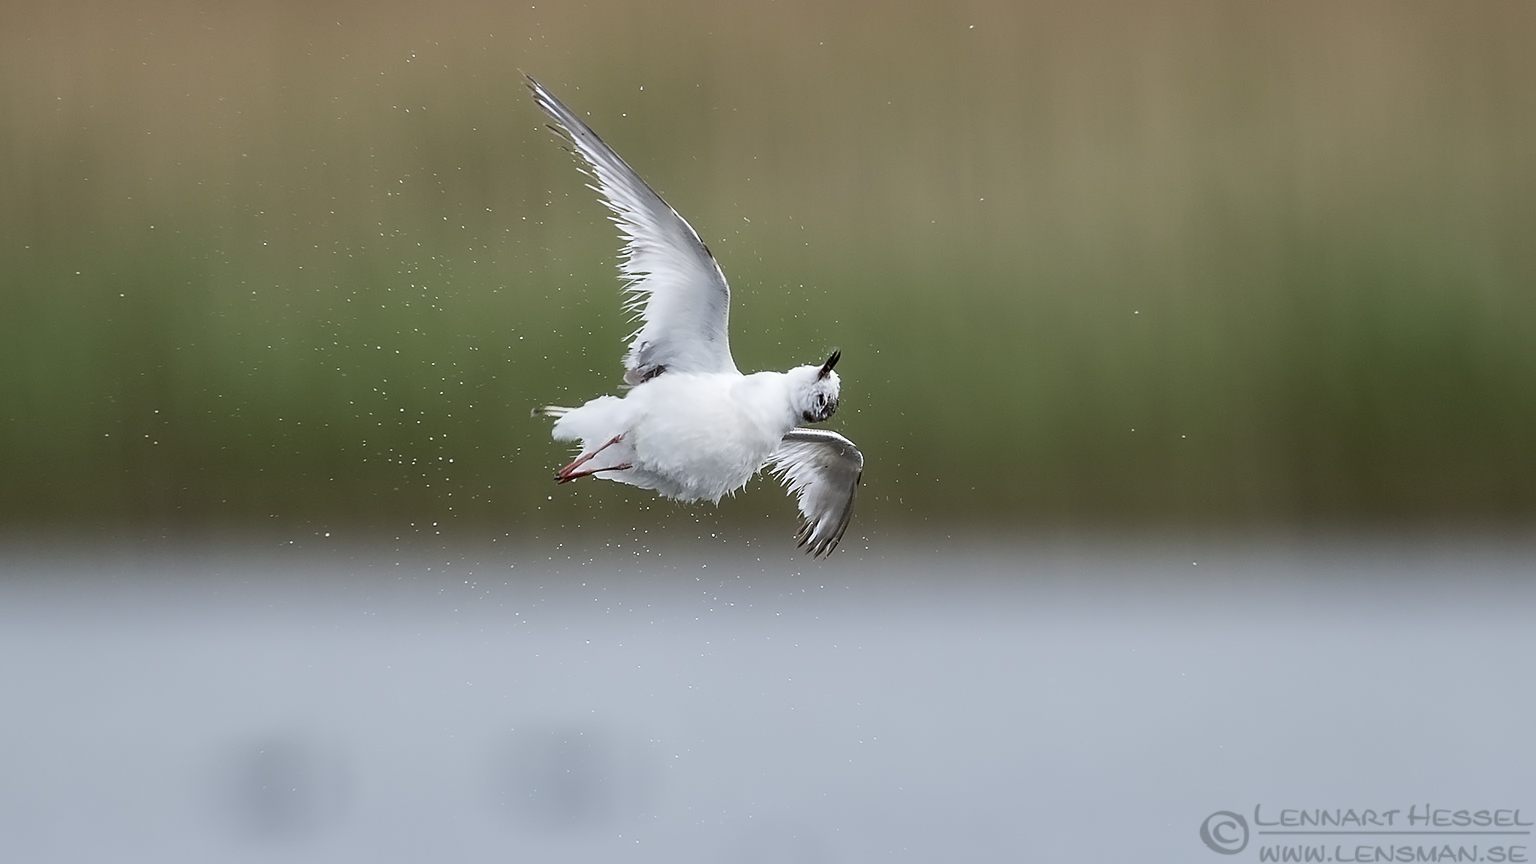 Shaking Little Gull Bulgaria 2016